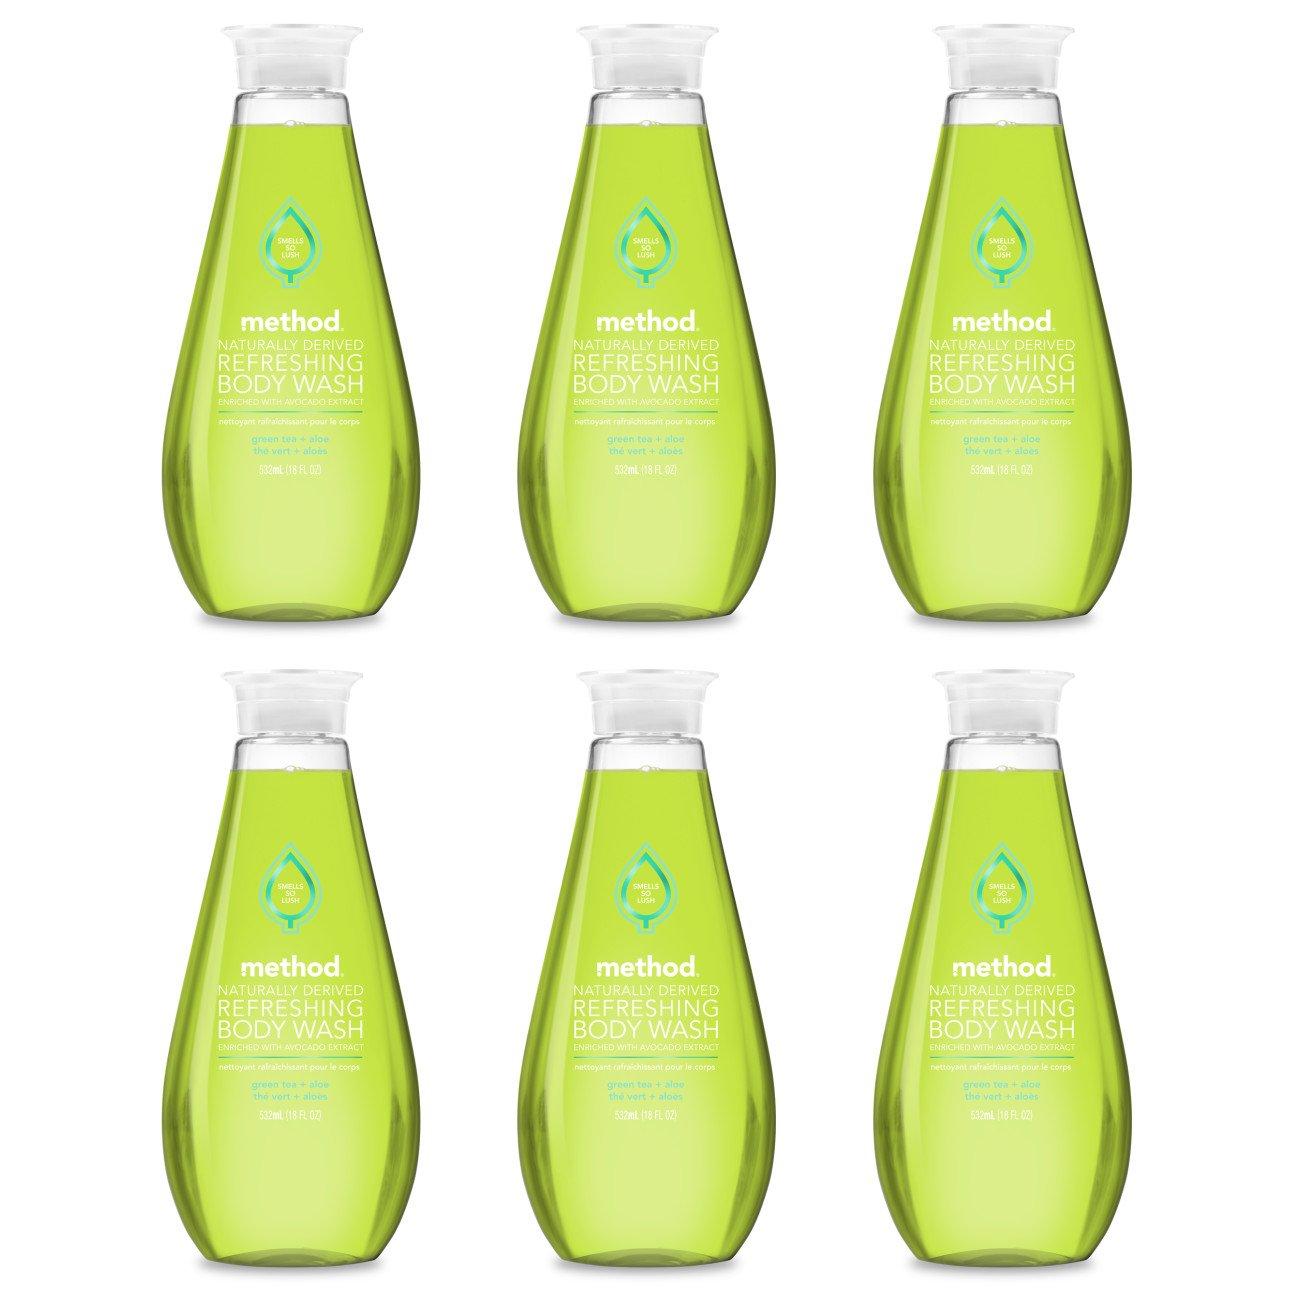 Method Refreshing Body Wash, Green Tea Aloe, 18 Ounce 6 Count